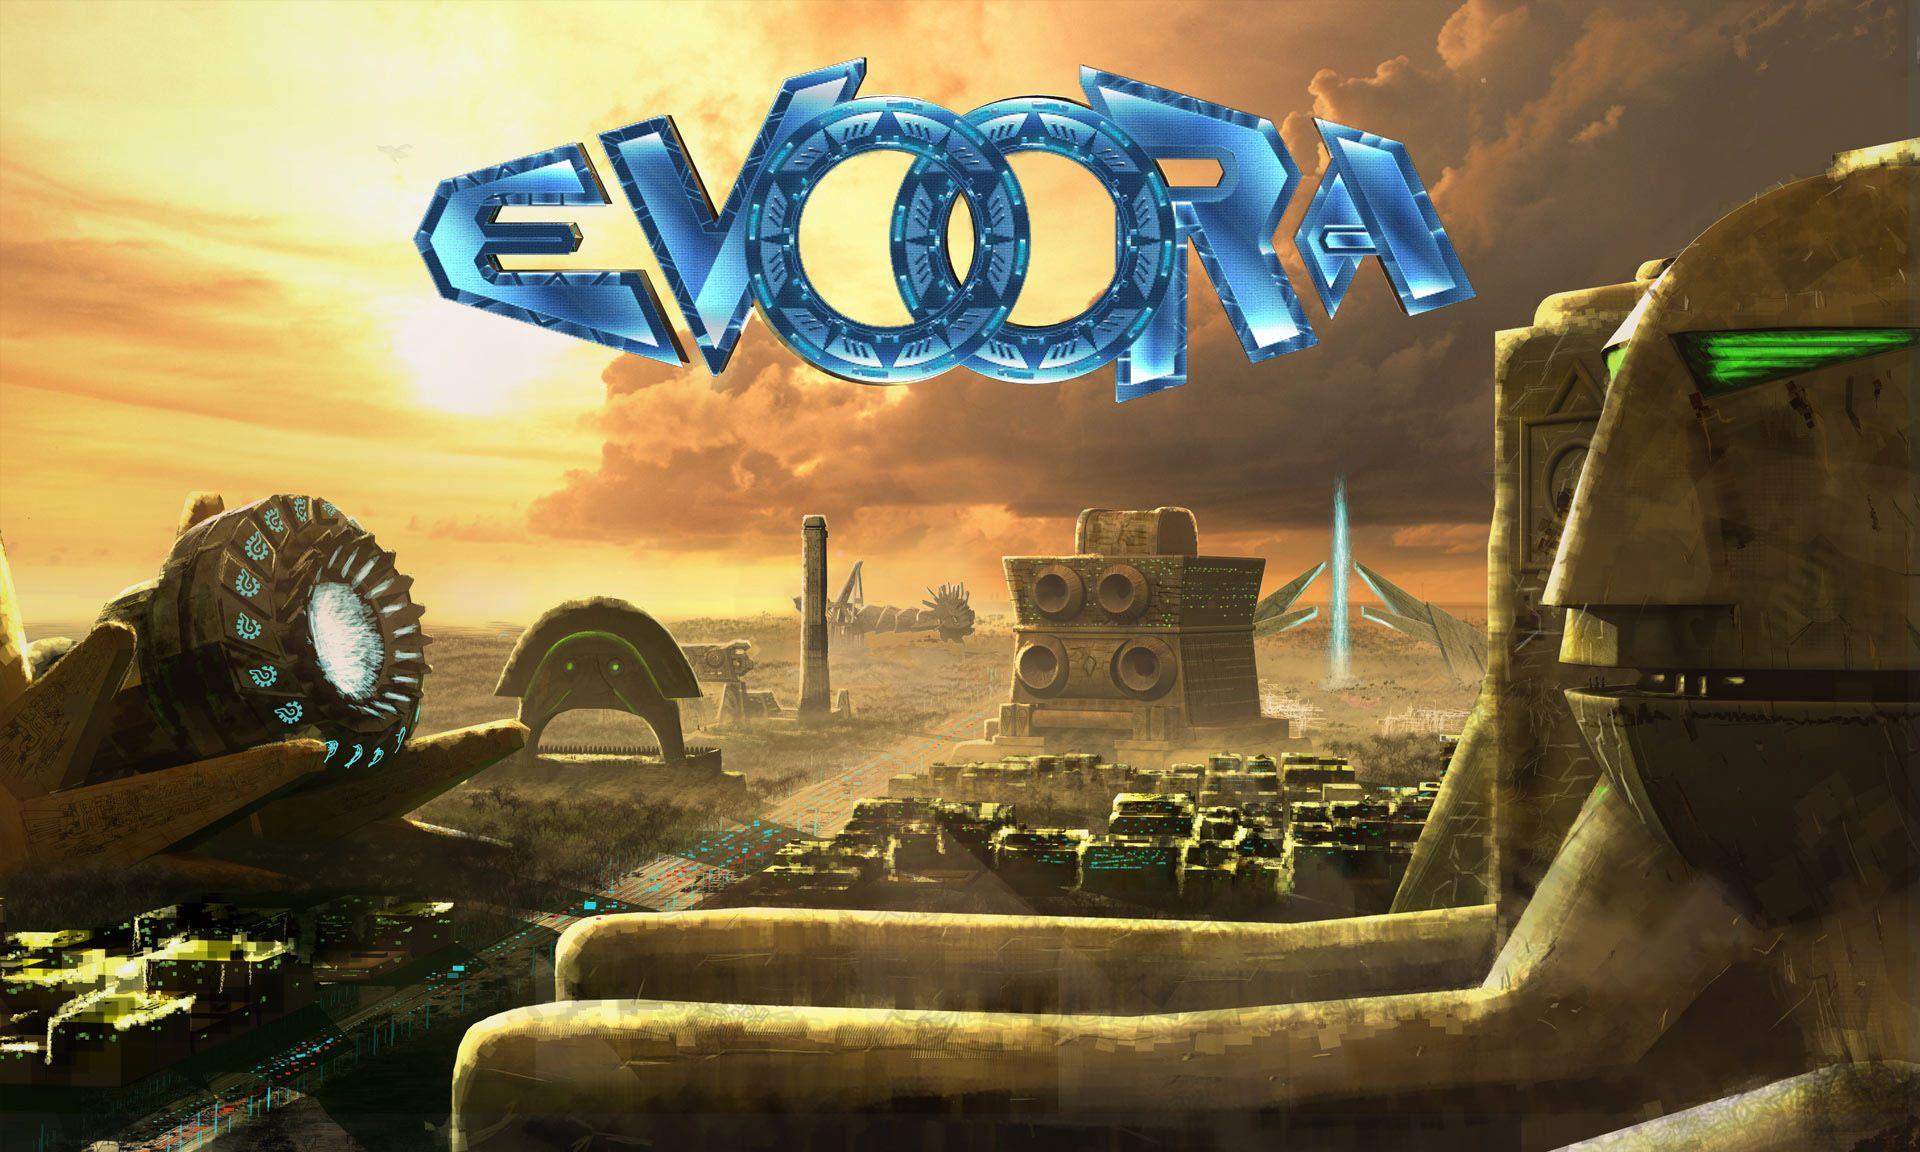 Evoora Logo